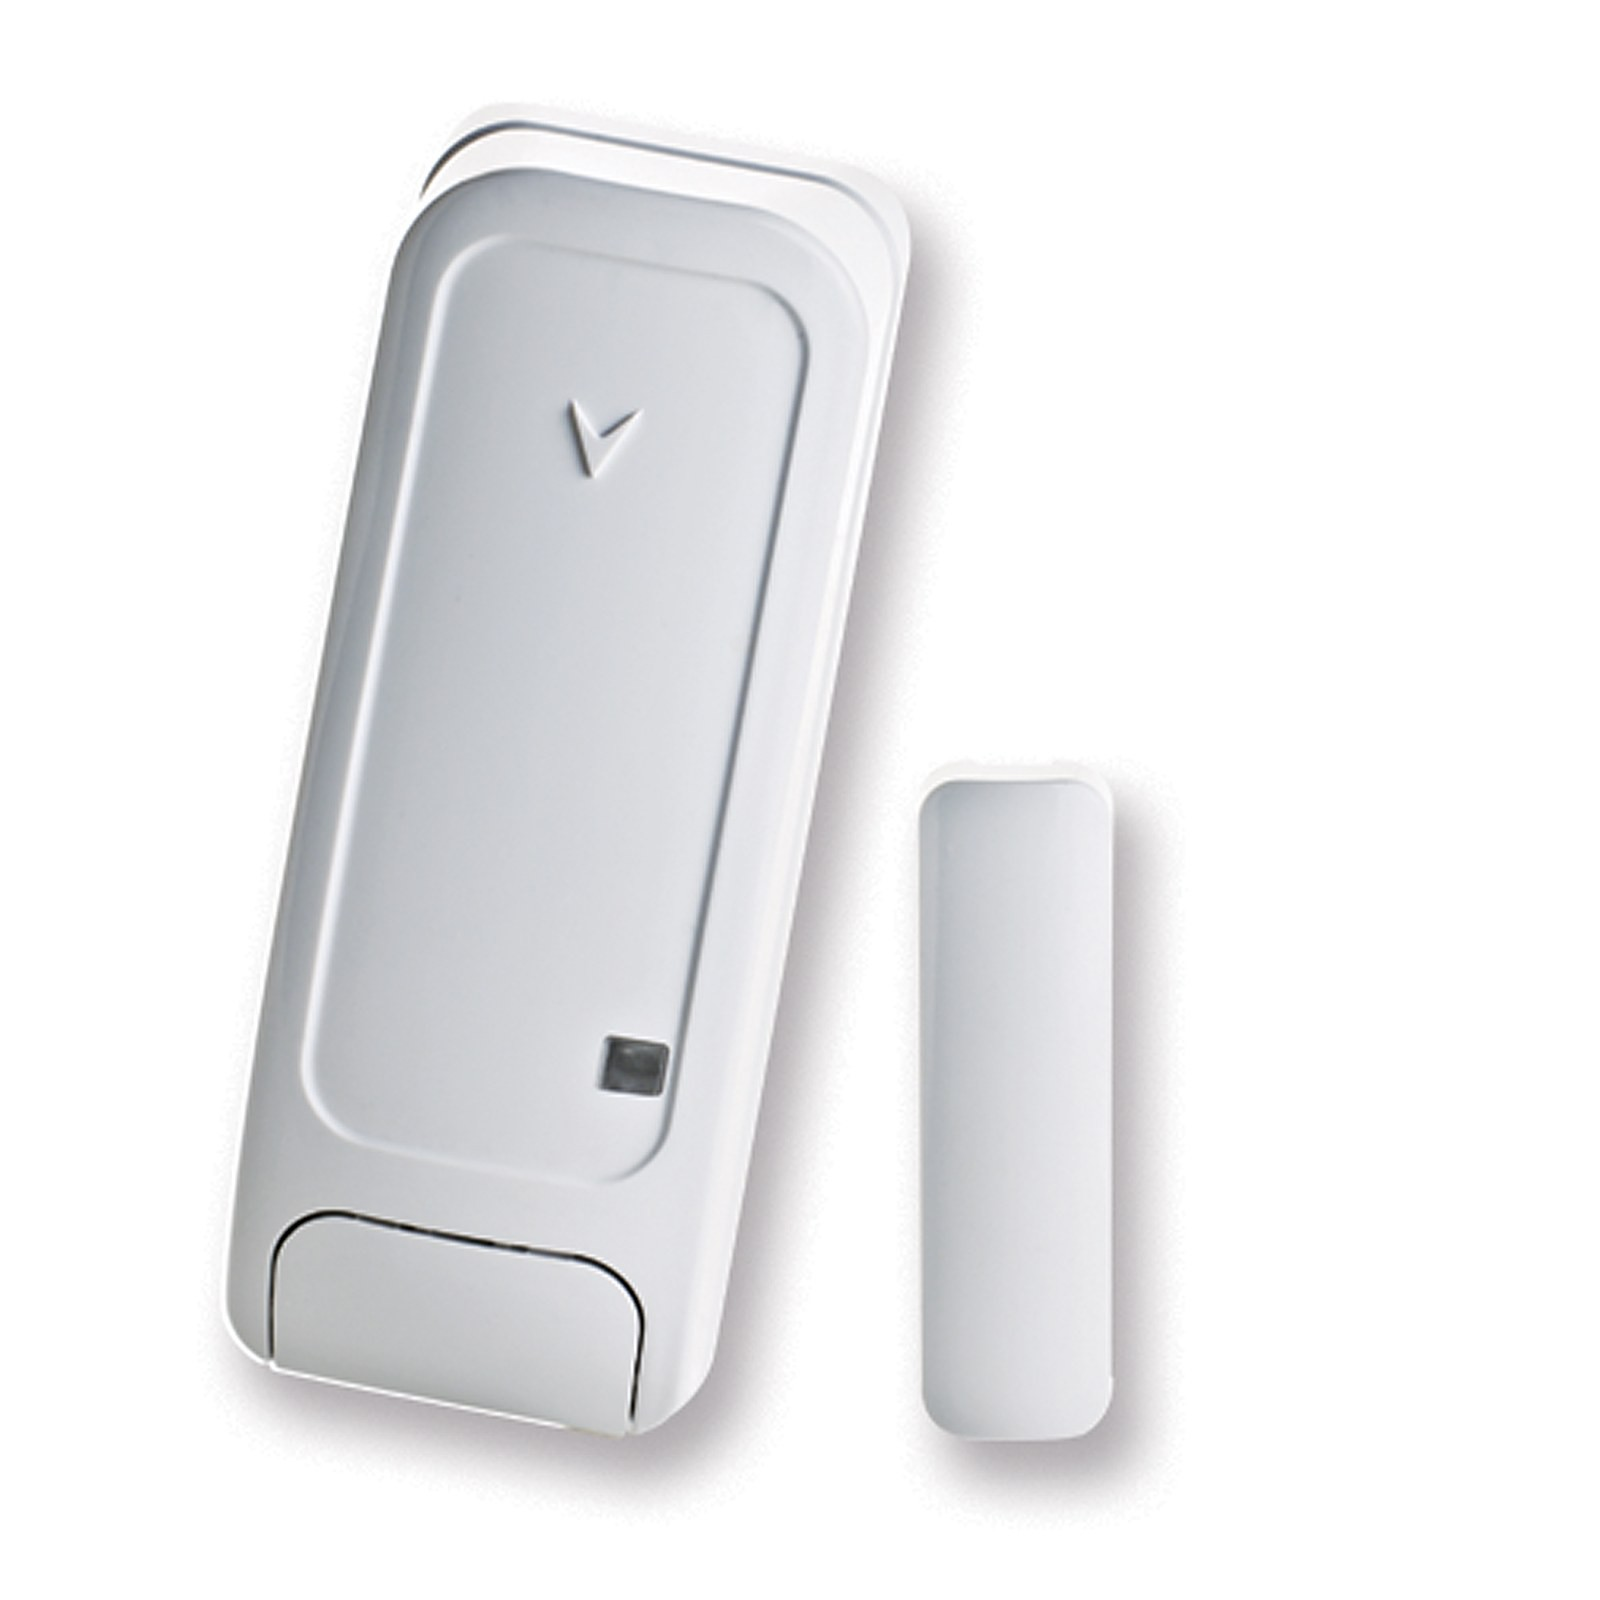 Kit antifurto allarme wireless telecamera bentel bw30 senza fili combinatore gsm area illumina - Antifurto porte e finestre ...